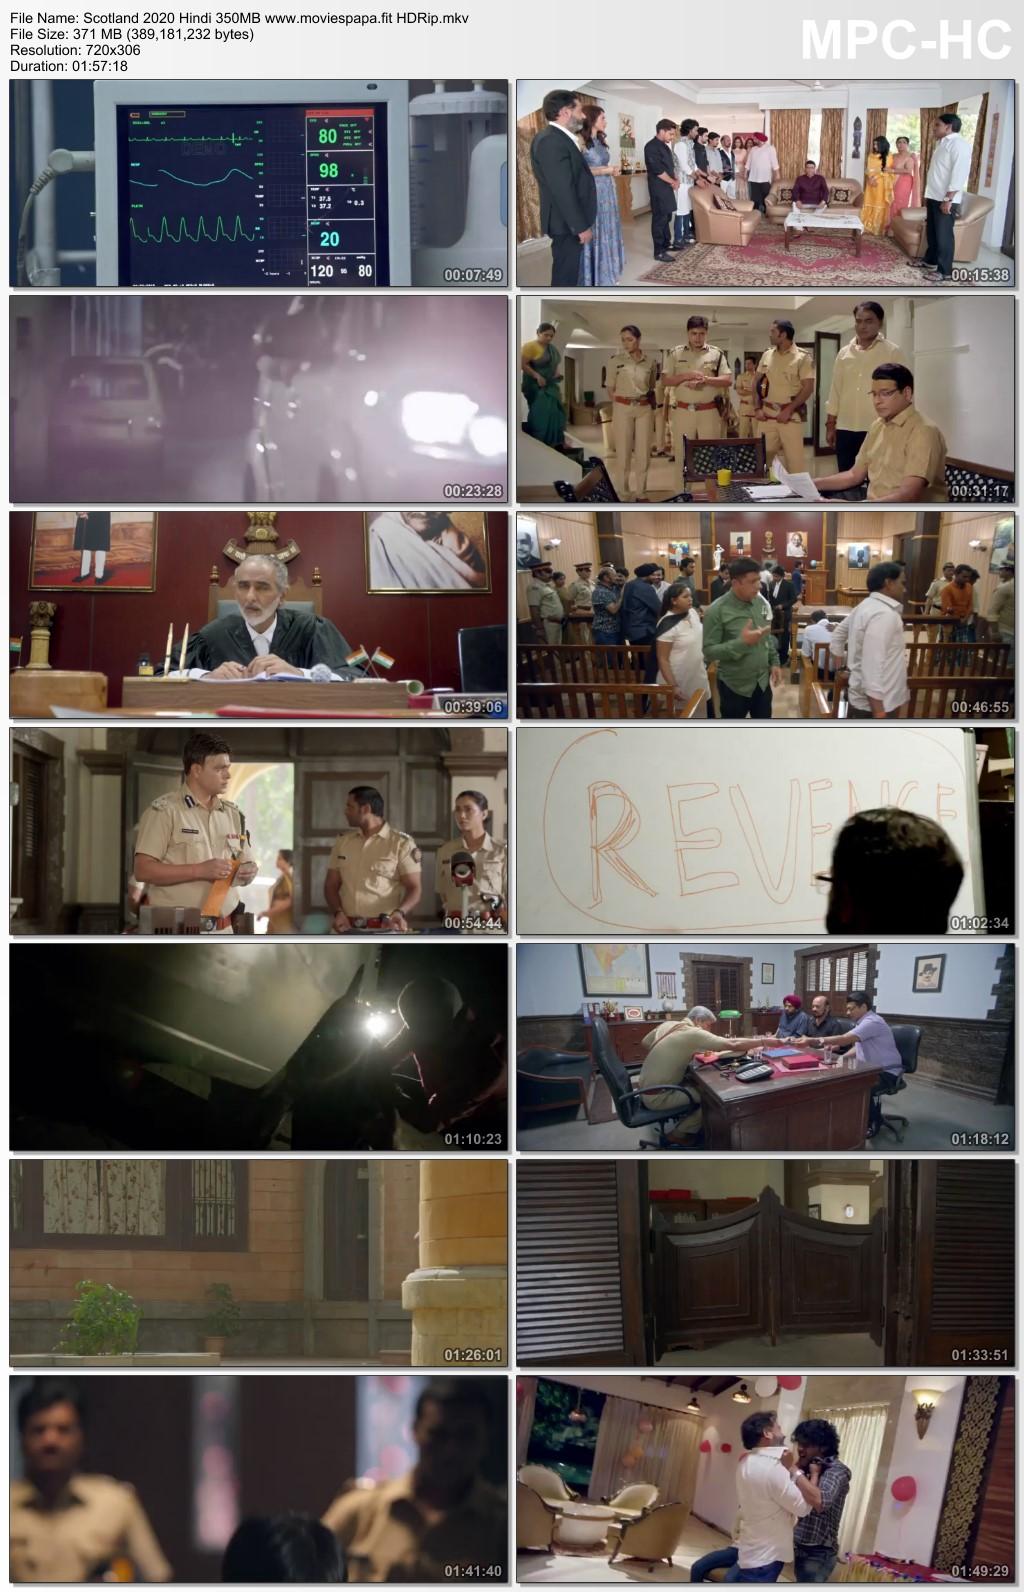 Scotland 2020 Hindi Movie 350MB HDRip Download